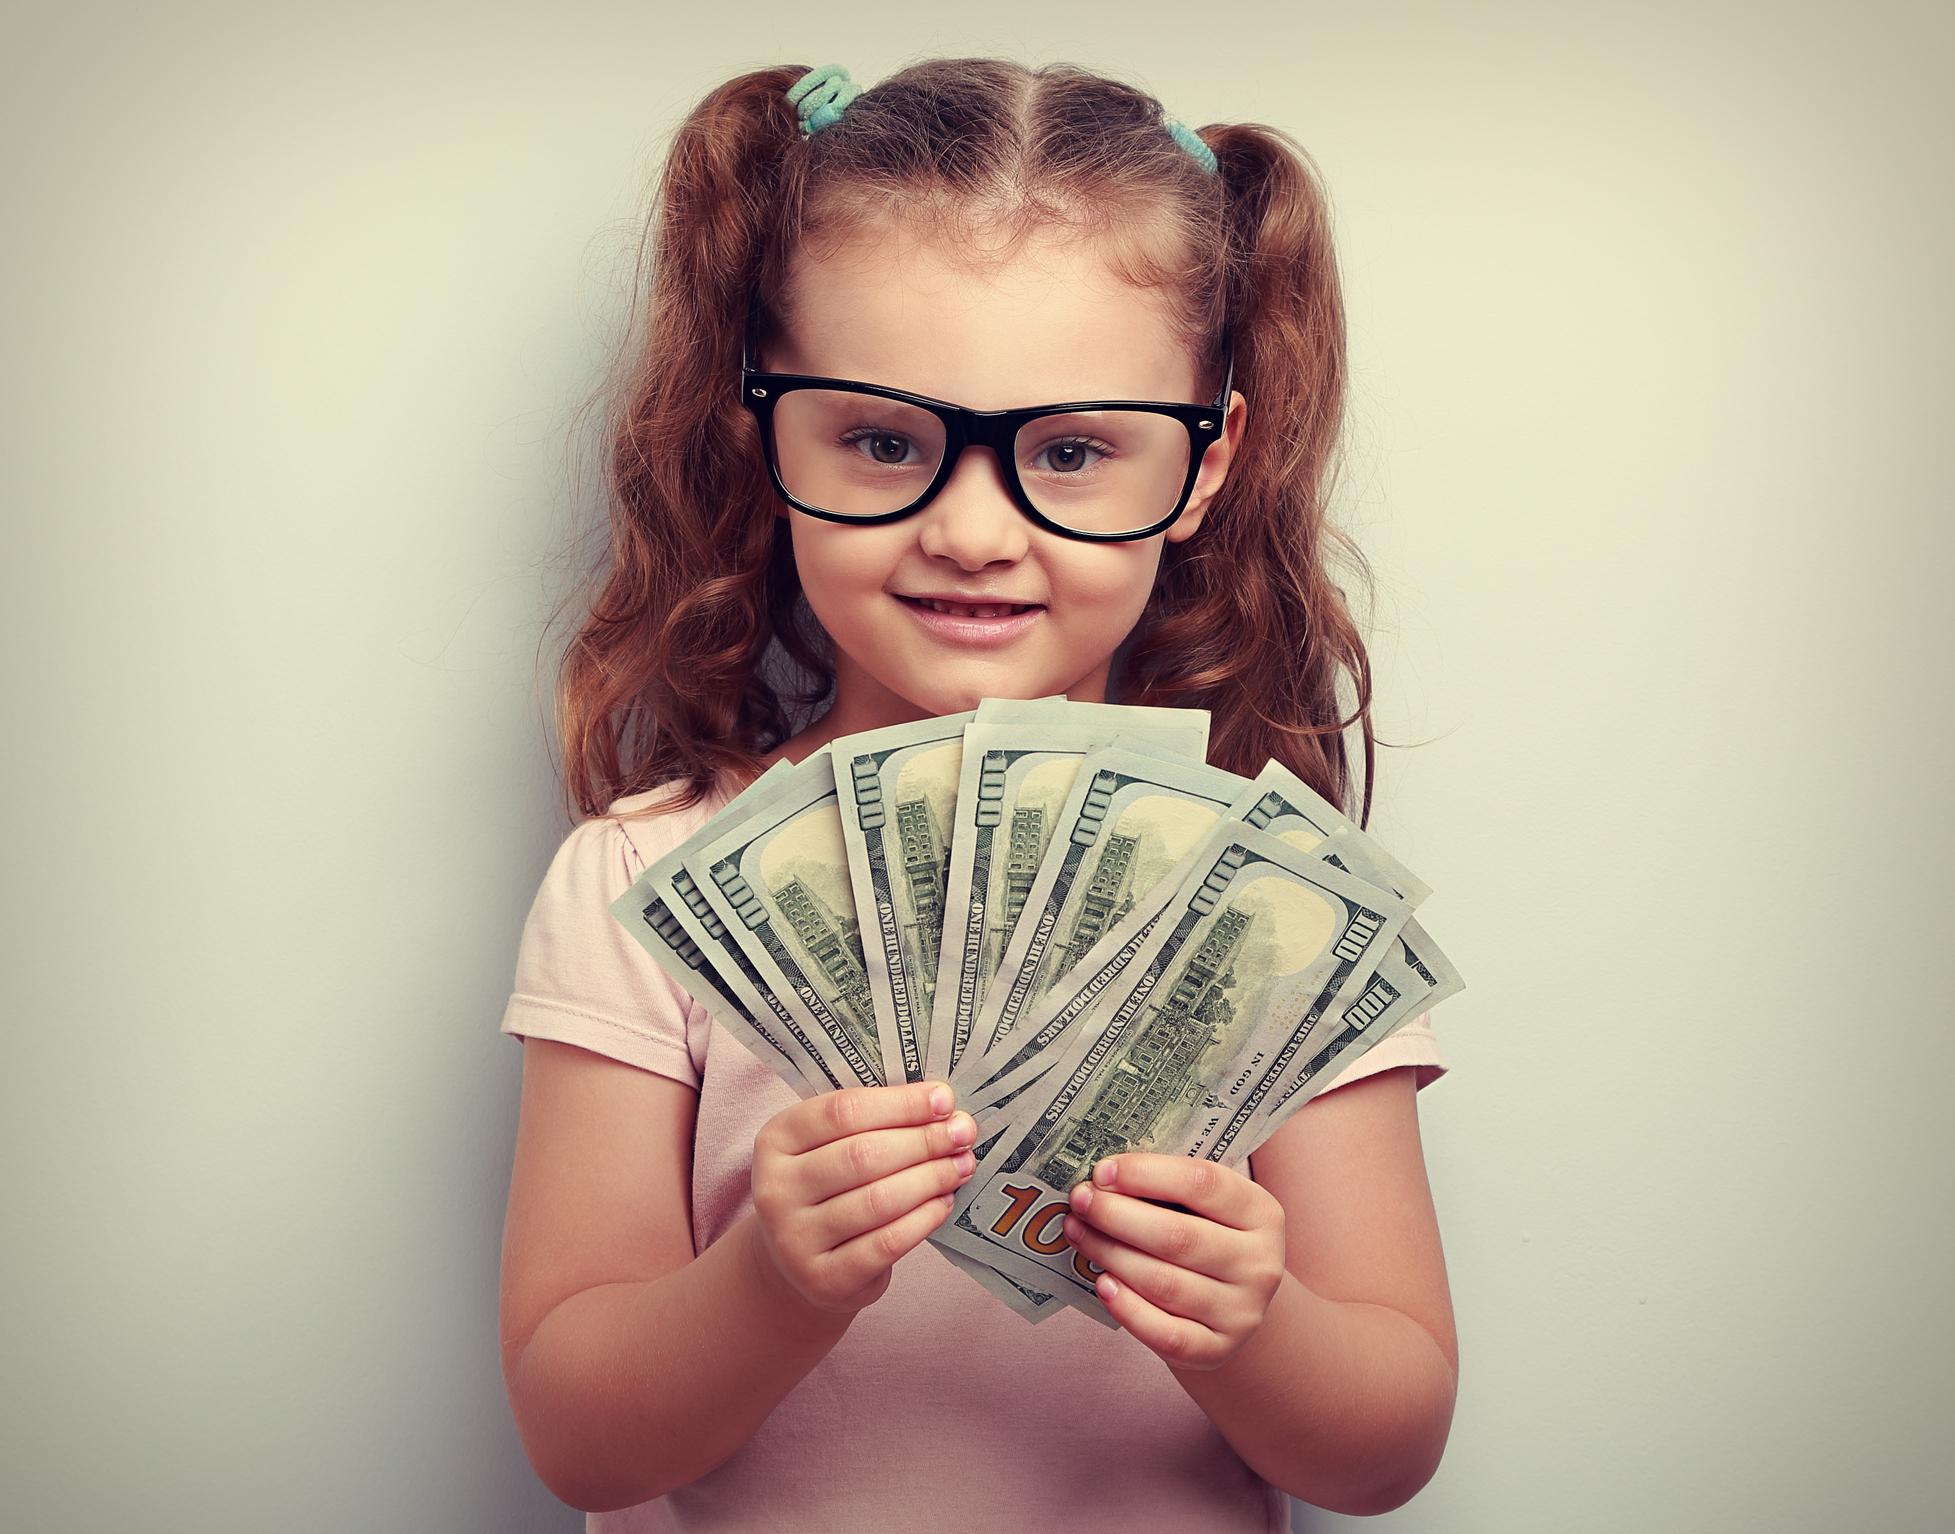 A little girl holdings many dollar bills.